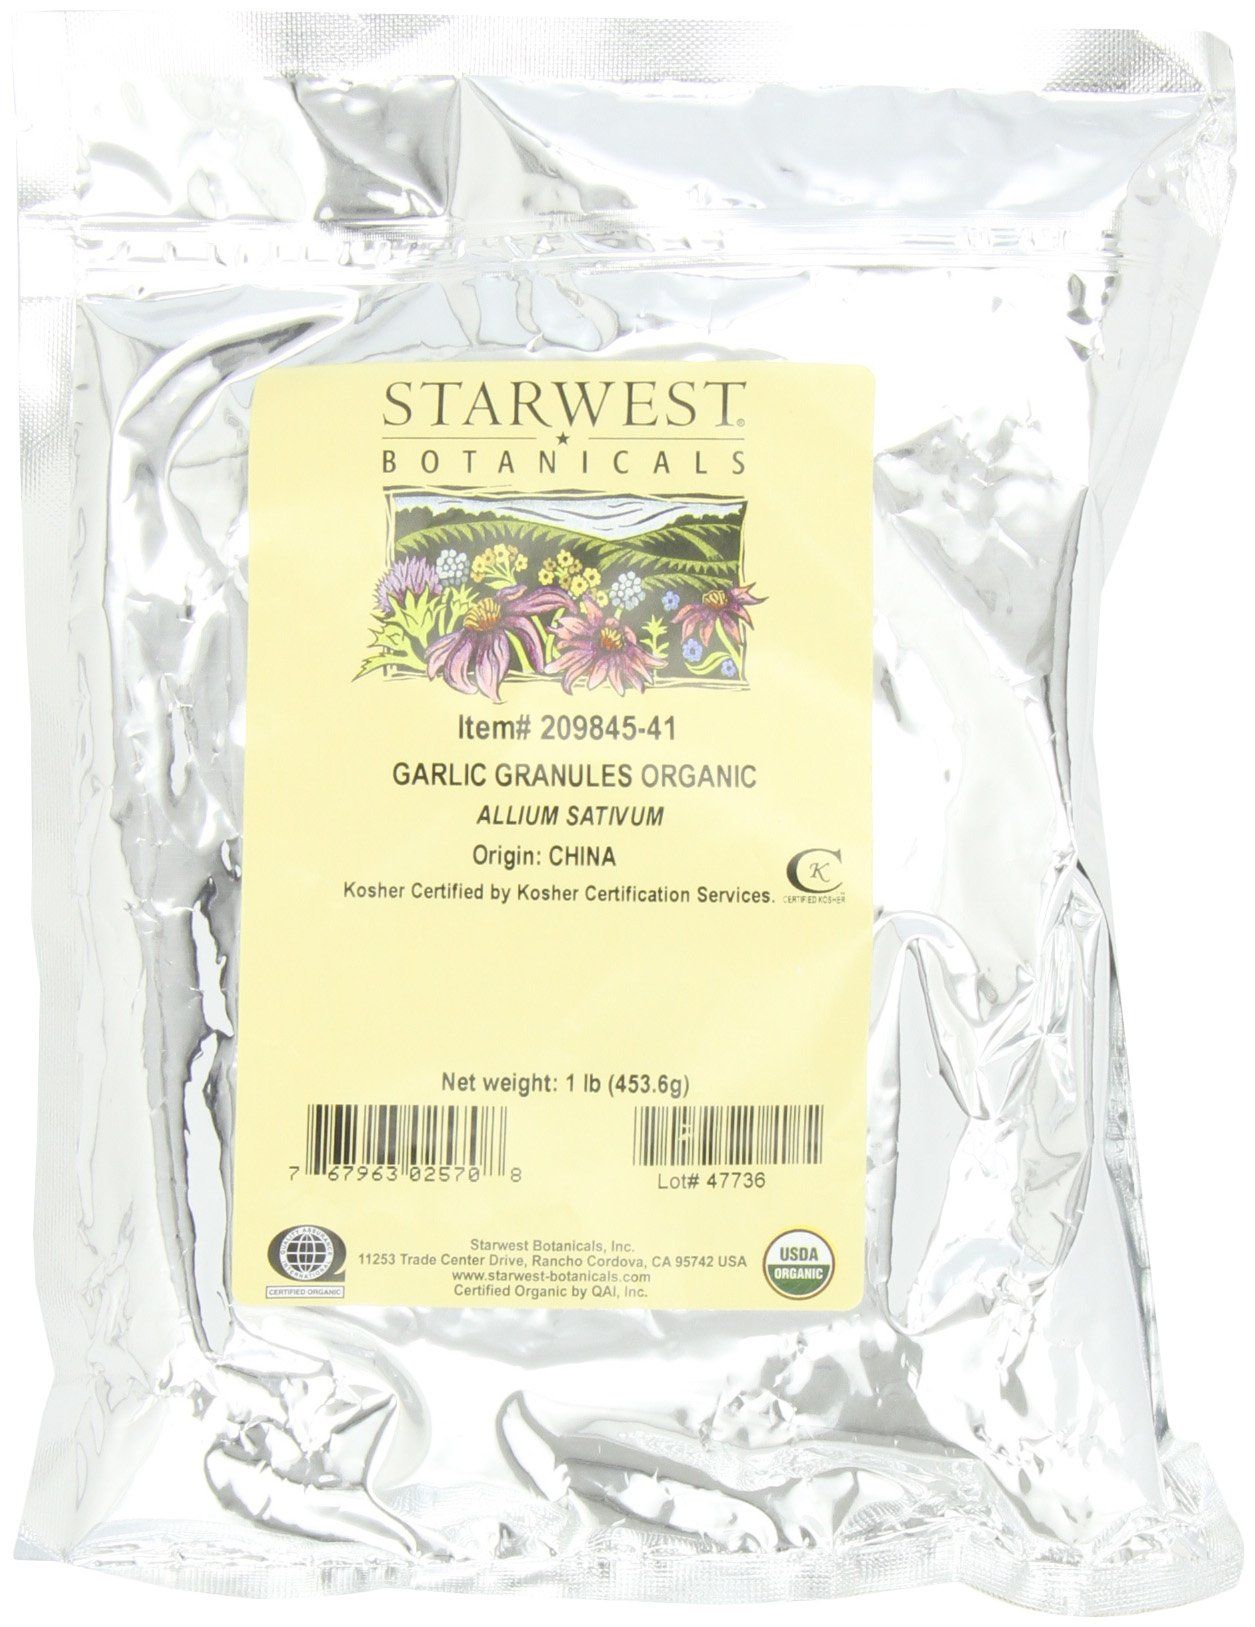 Starwest Botanicals Organic Garlic Granules, 1-pound Bags (Pack of 3)